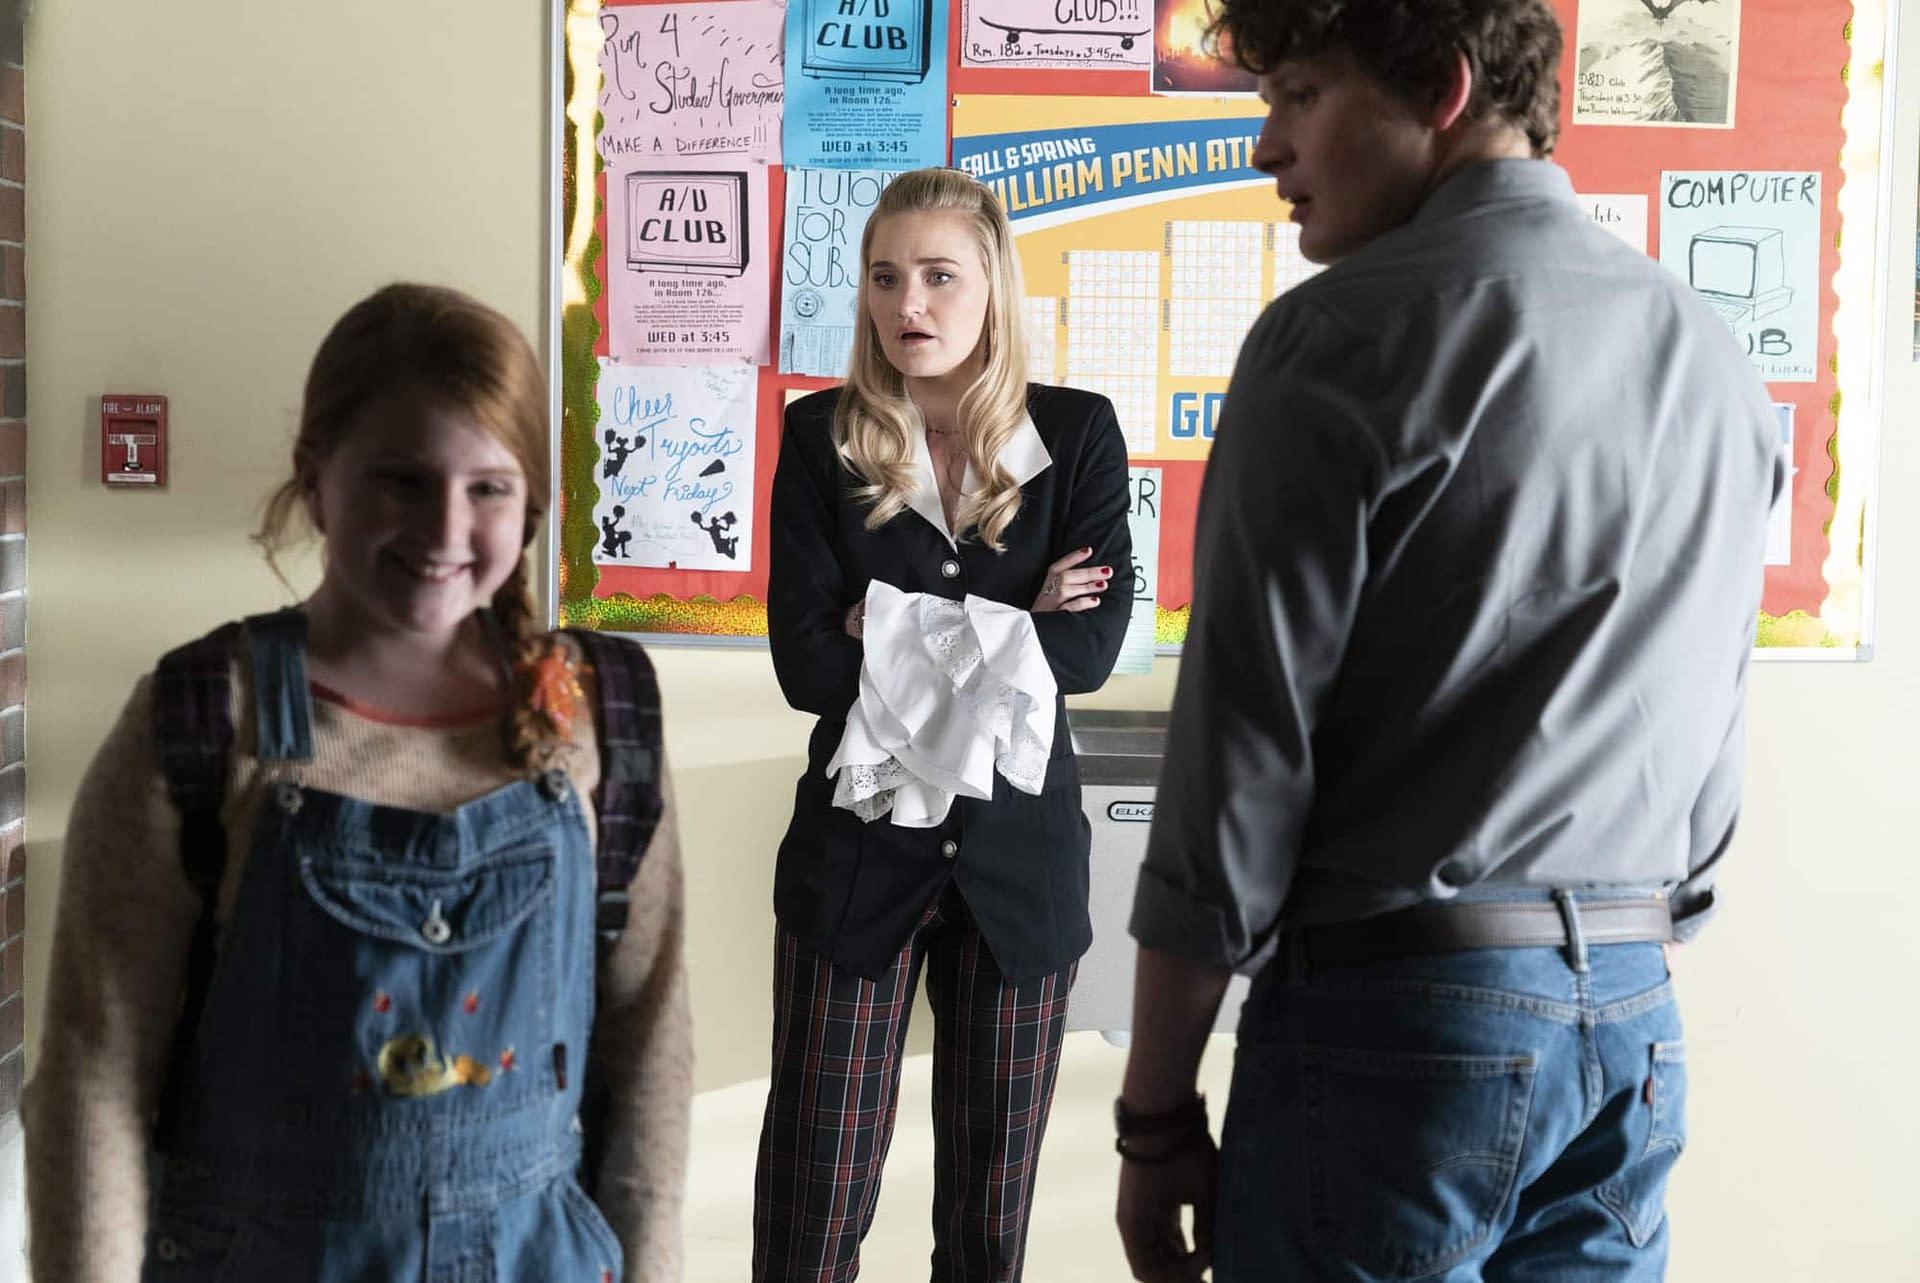 Schooled Season 1 Kris Kross Image 3